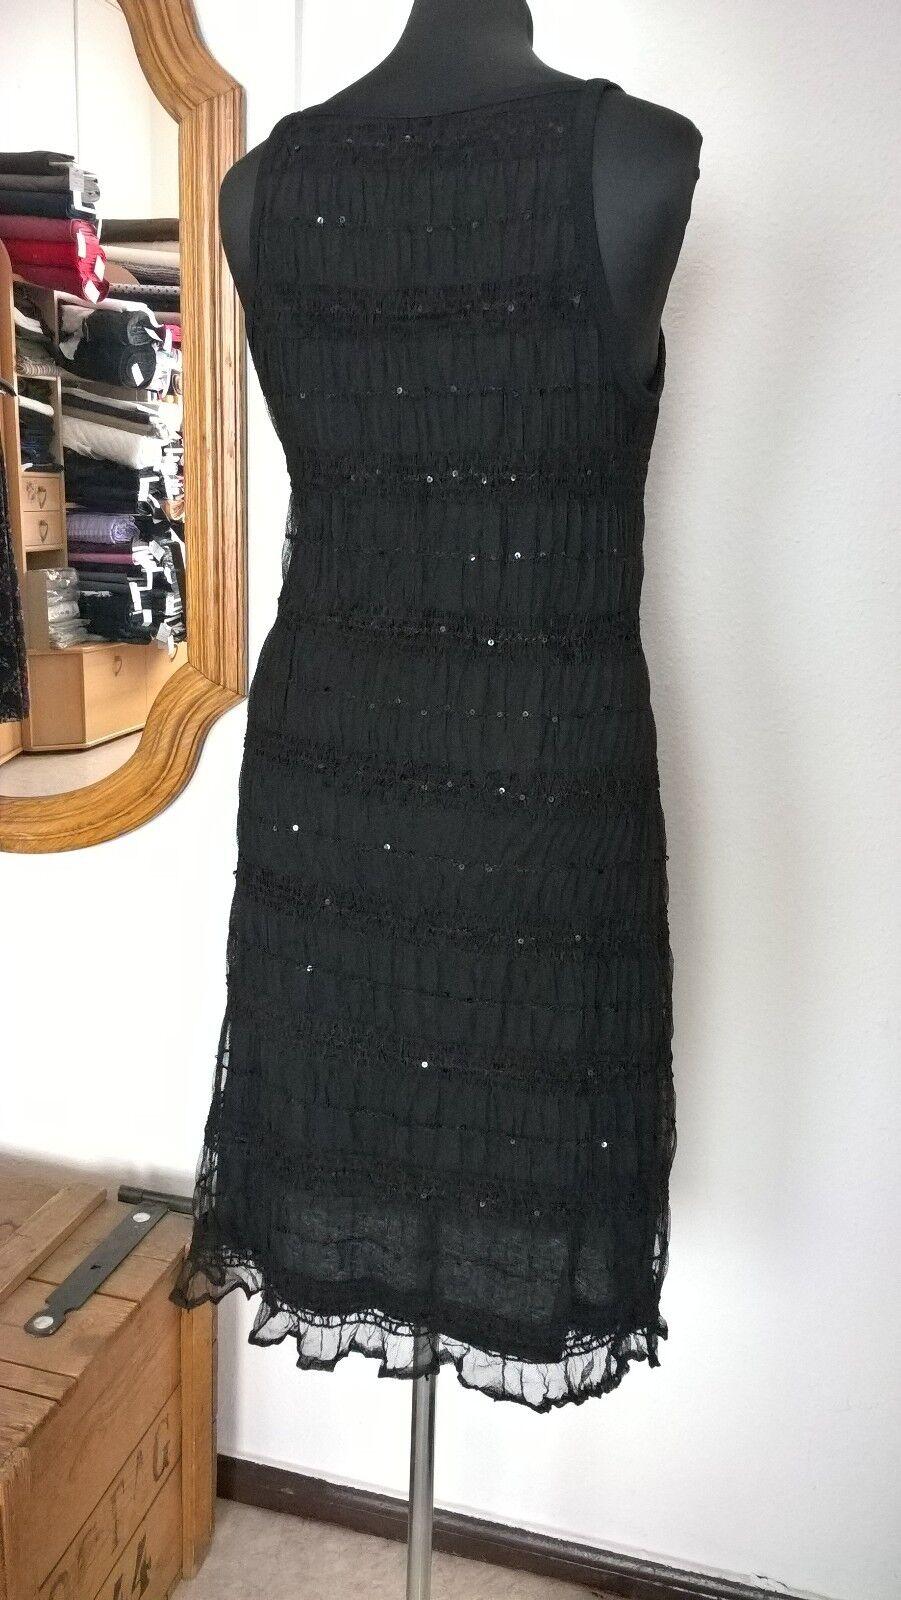 NEU NEU NEU Spitzen Kleid,ABENDKLEID,schwarz Gr.40,knielang,Sommerkleid,Trägerkleid NEU | Optimaler Preis  | Langfristiger Ruf  | Verrückter Preis  551cd4